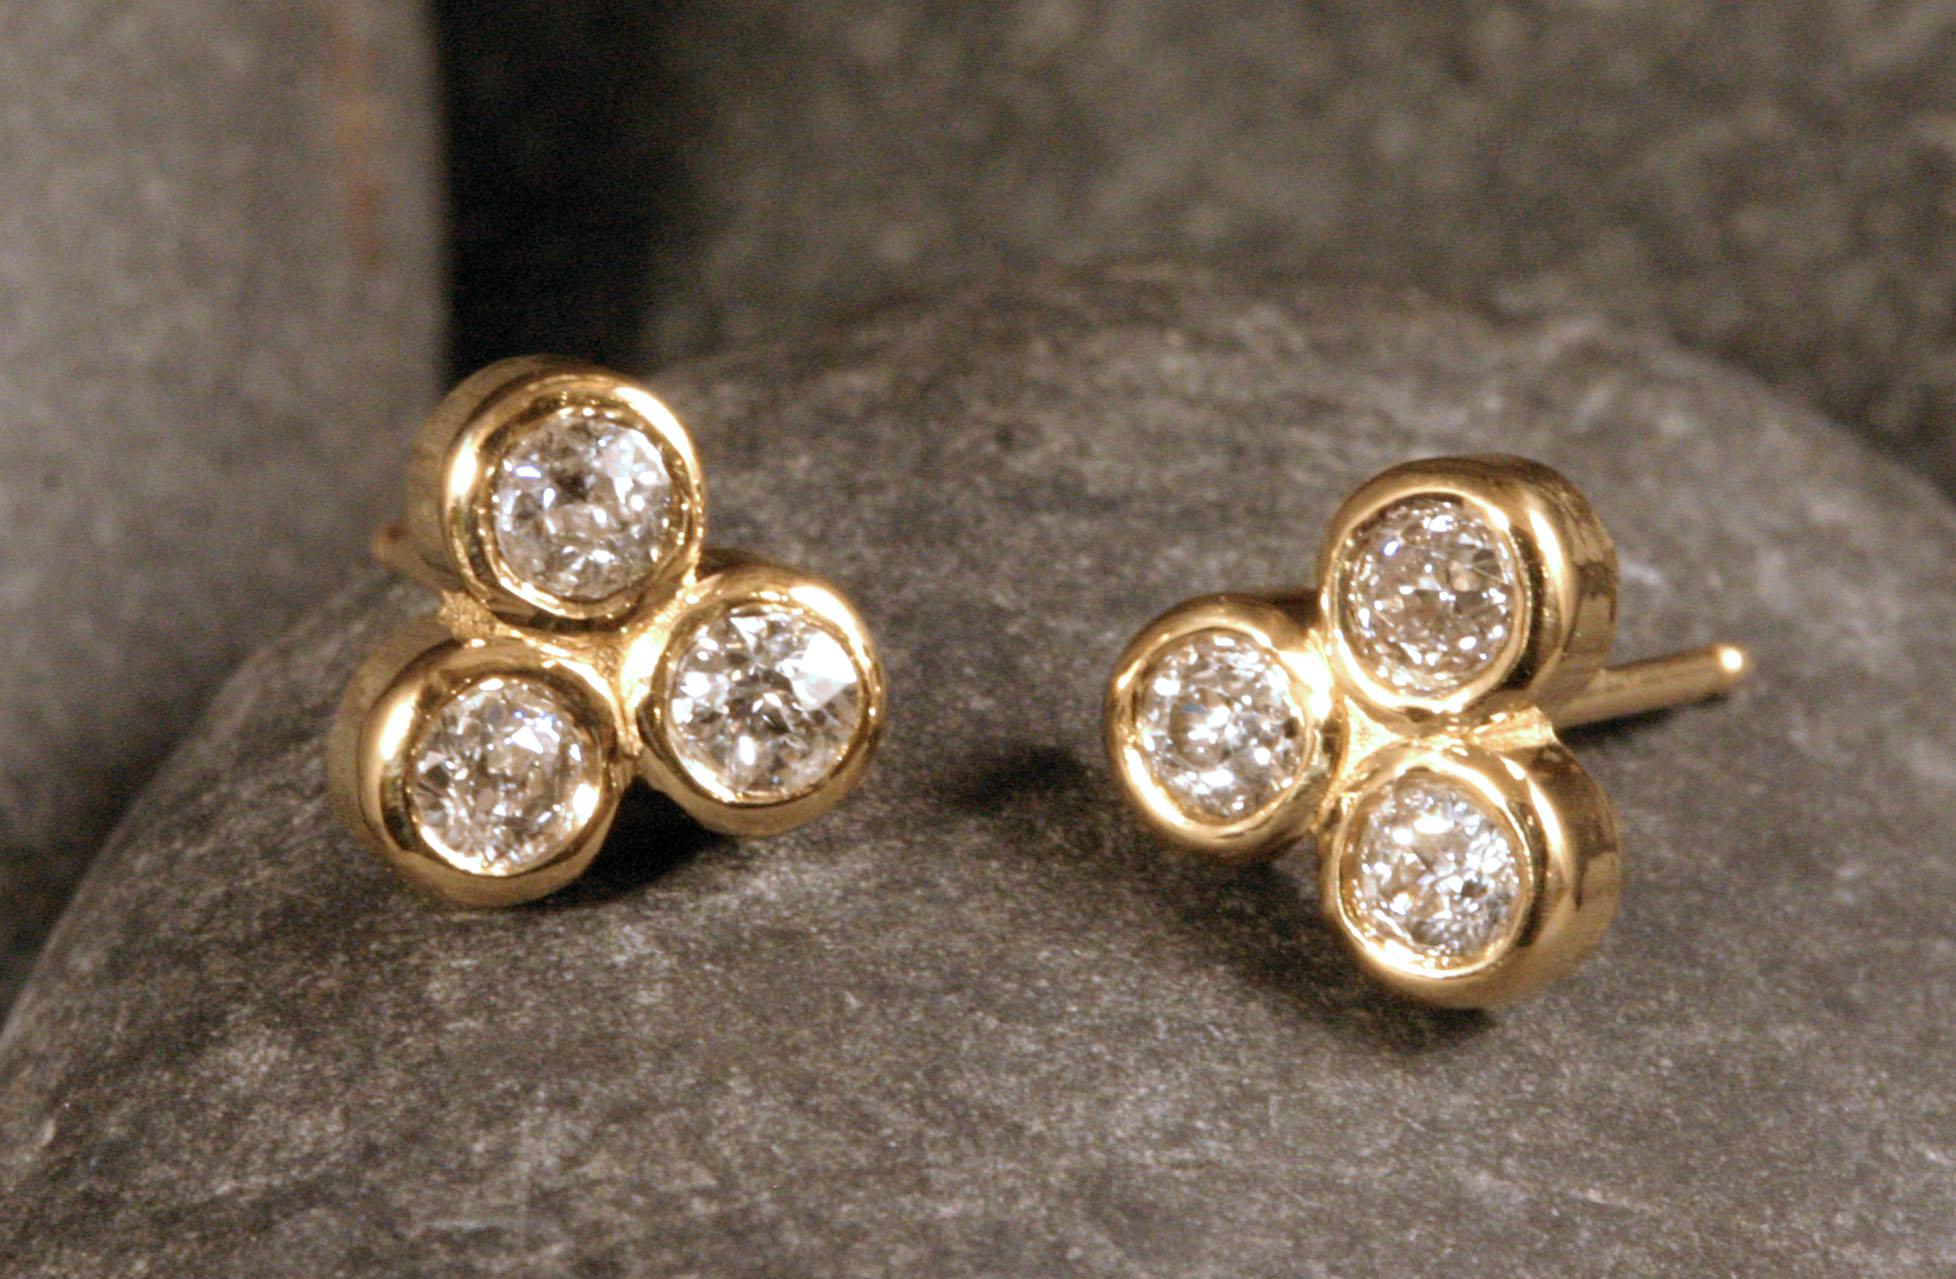 14K gold &diamond studs.